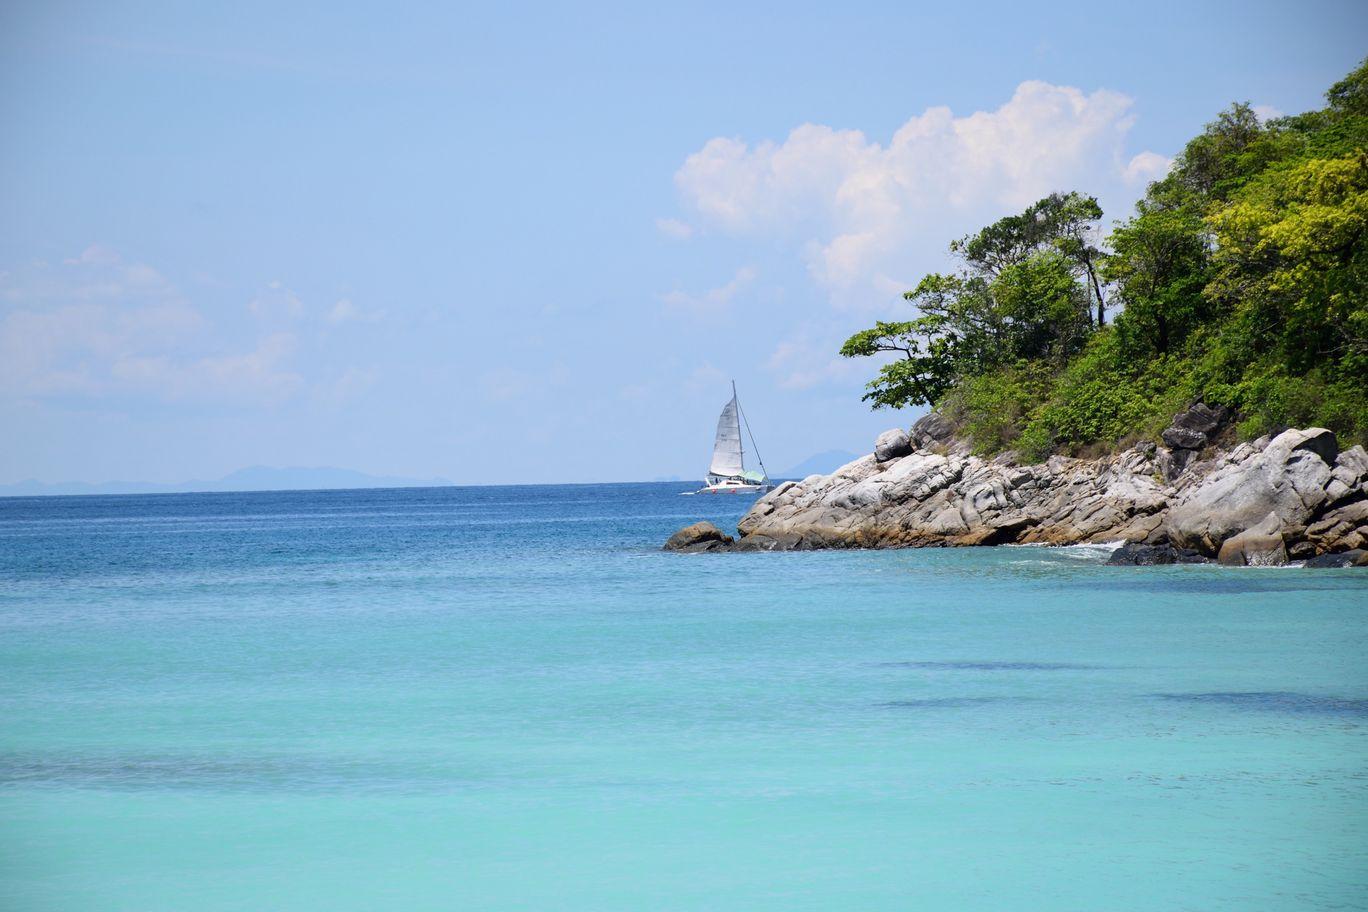 Photo of Racha noi island By Pooja kaushik